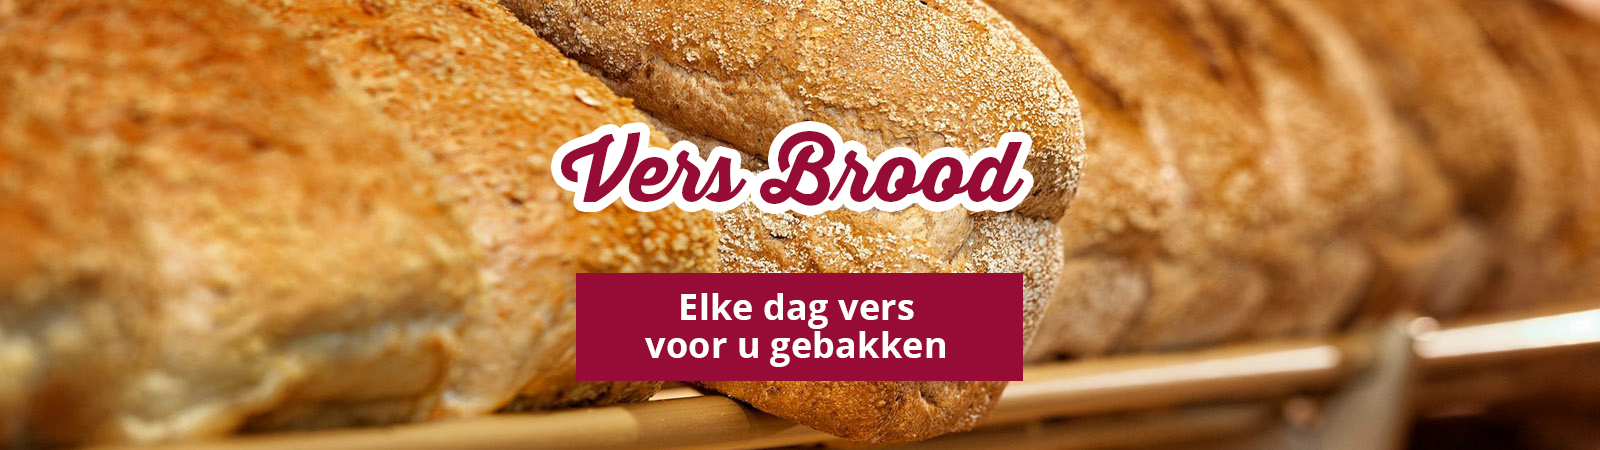 Bakkerij Bosgoed elke dag vers brood